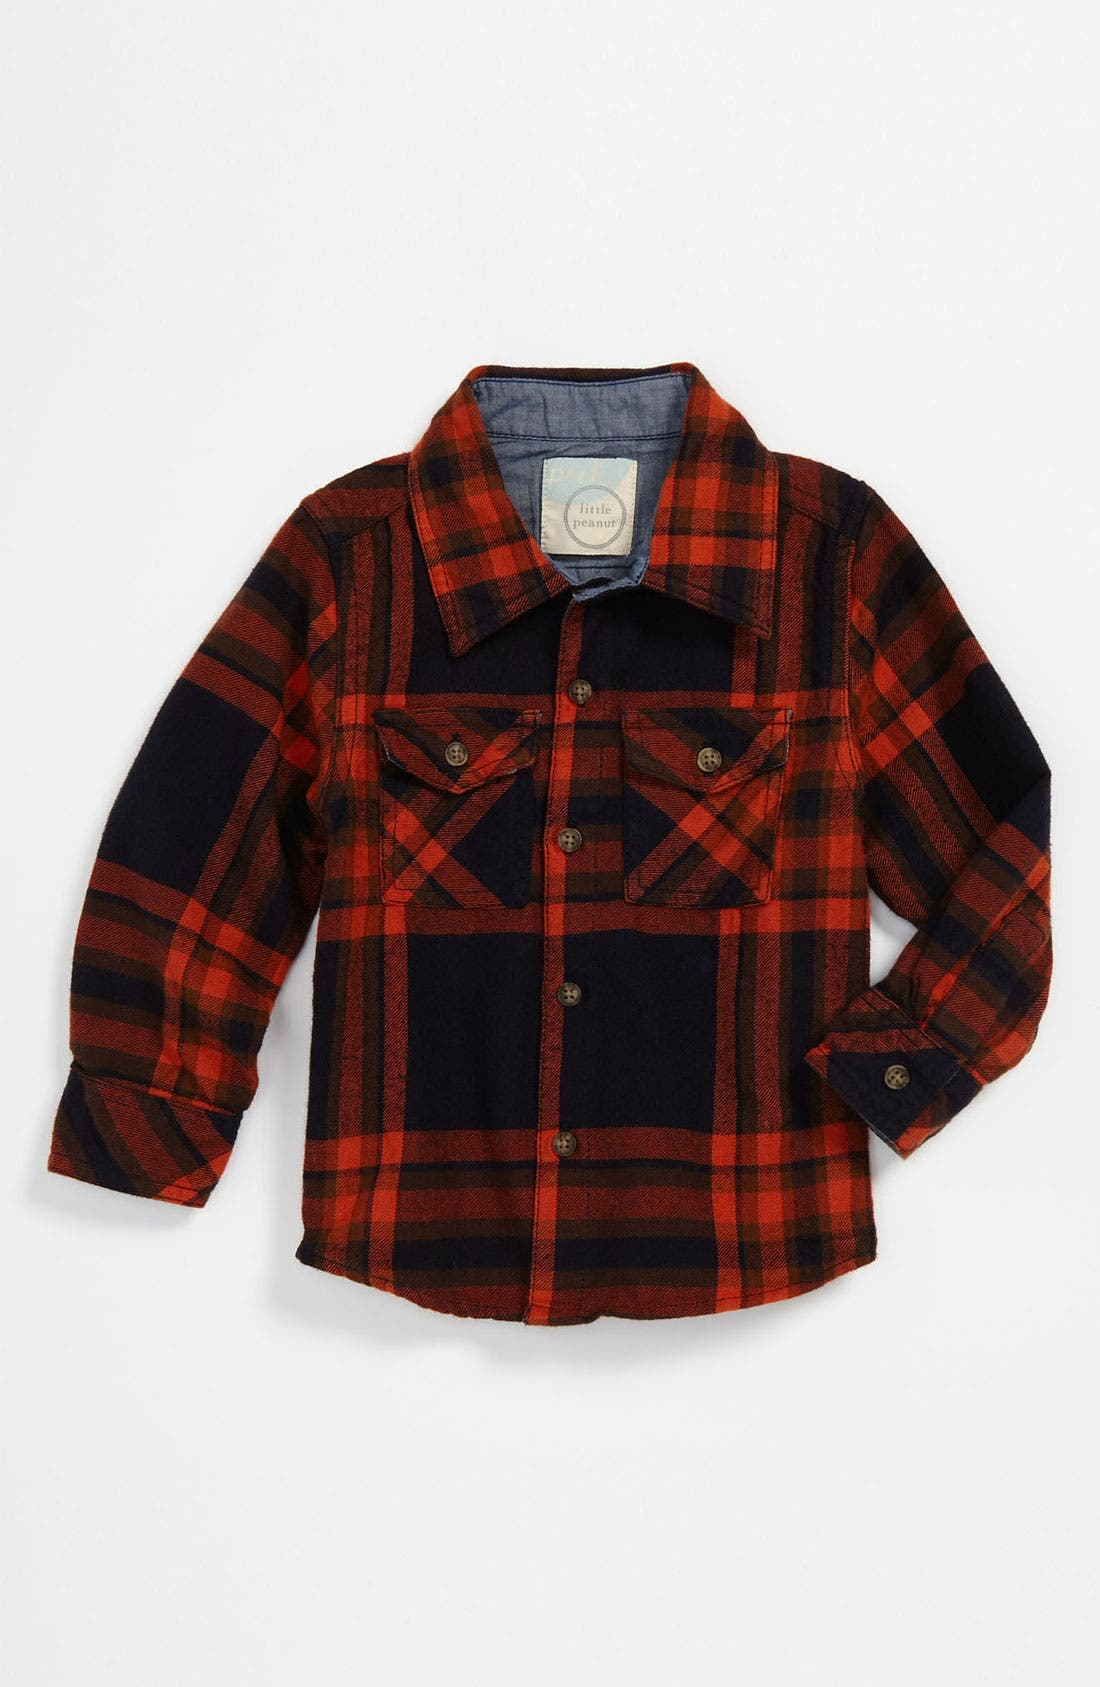 Main Image - Peek 'Big Horn' Plaid Shirt (Infant)